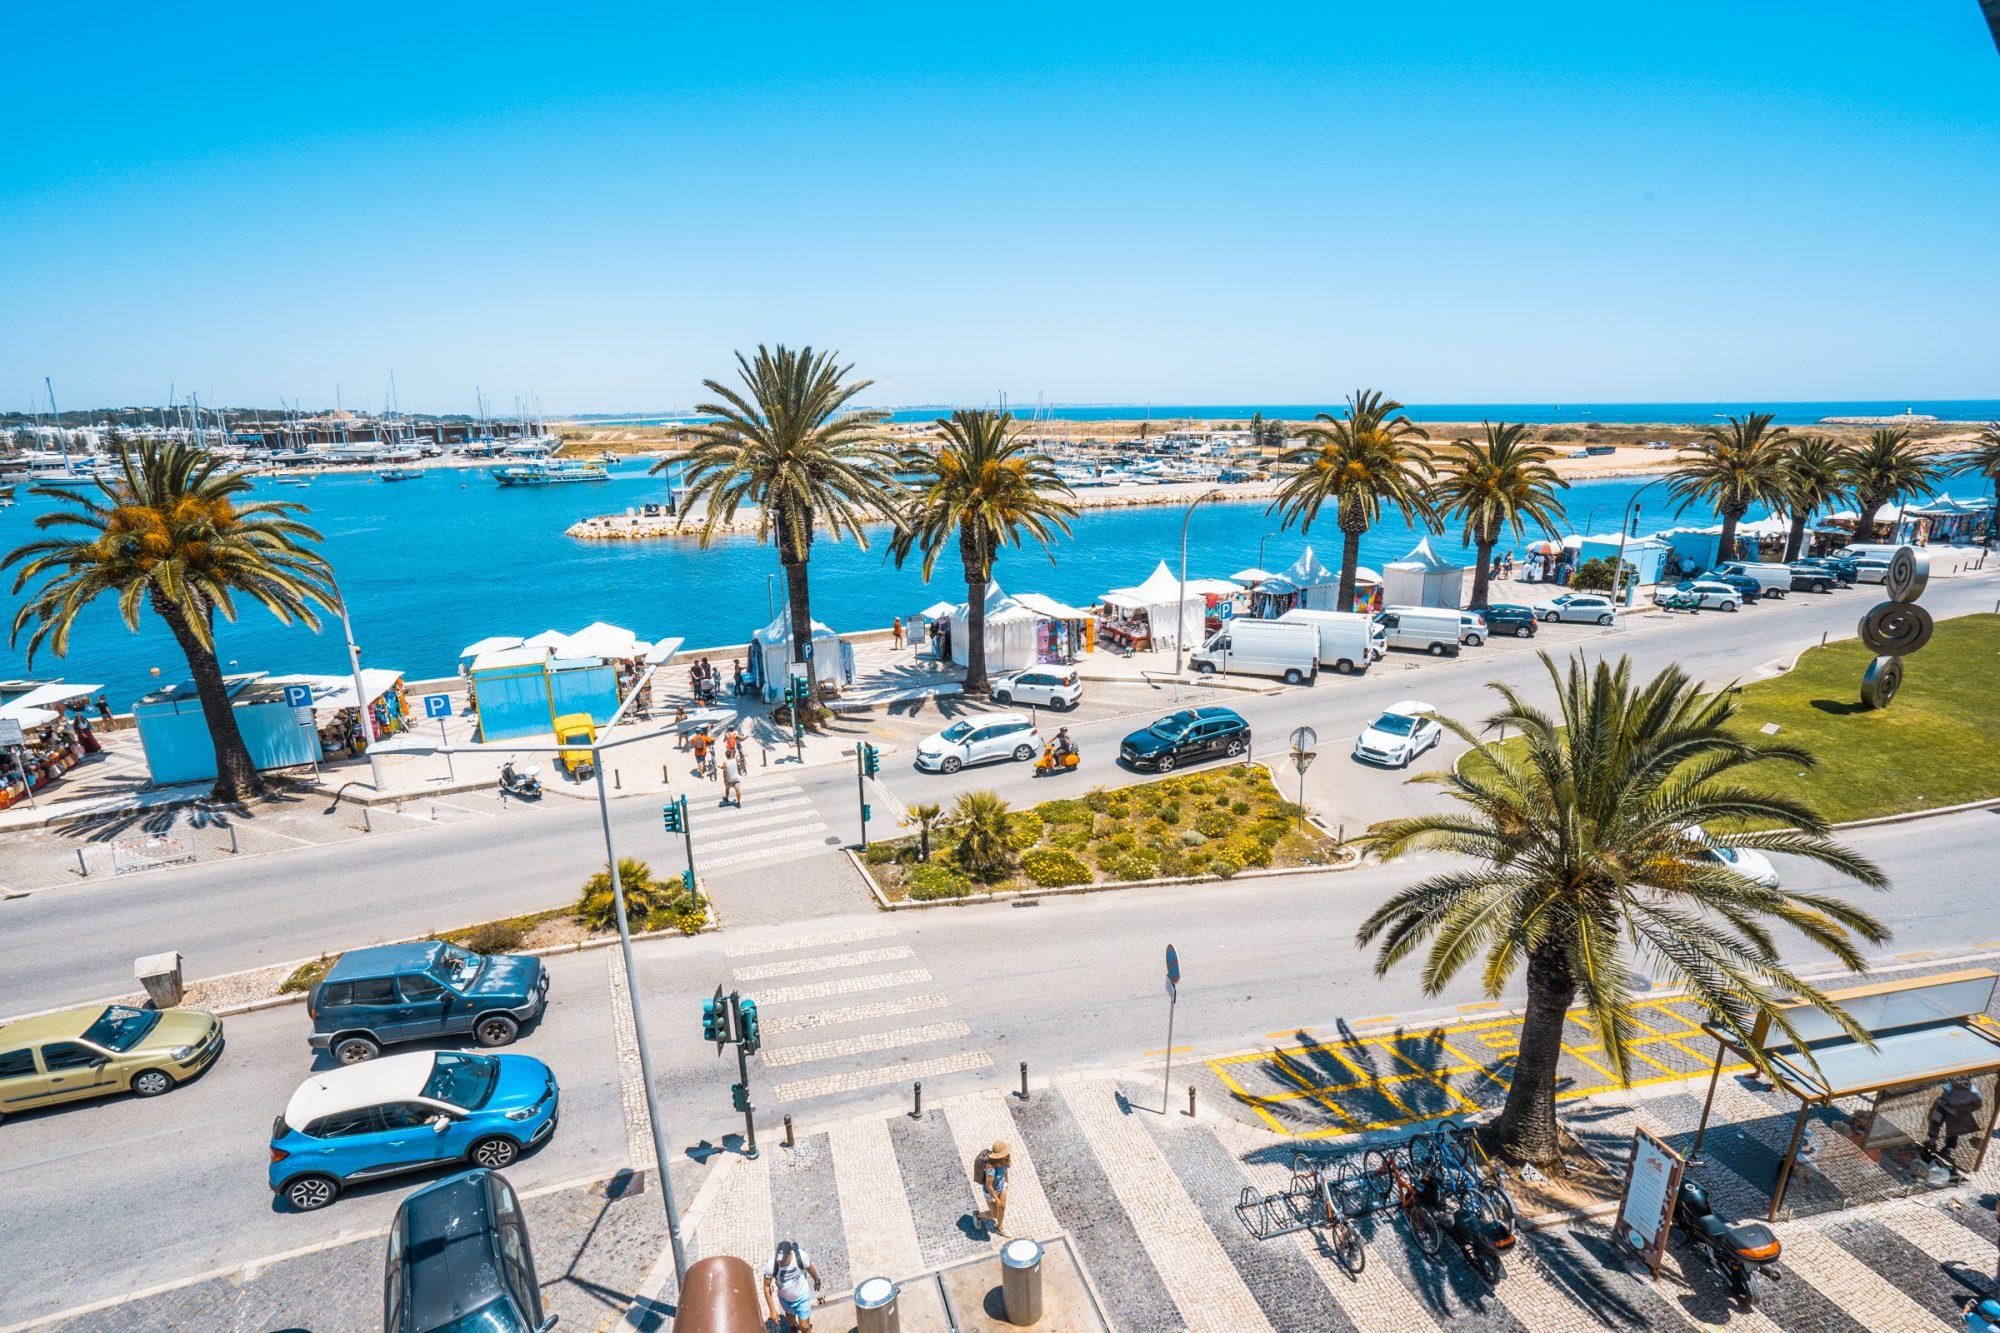 Lagos, Algarve Tipps, schöne Orte